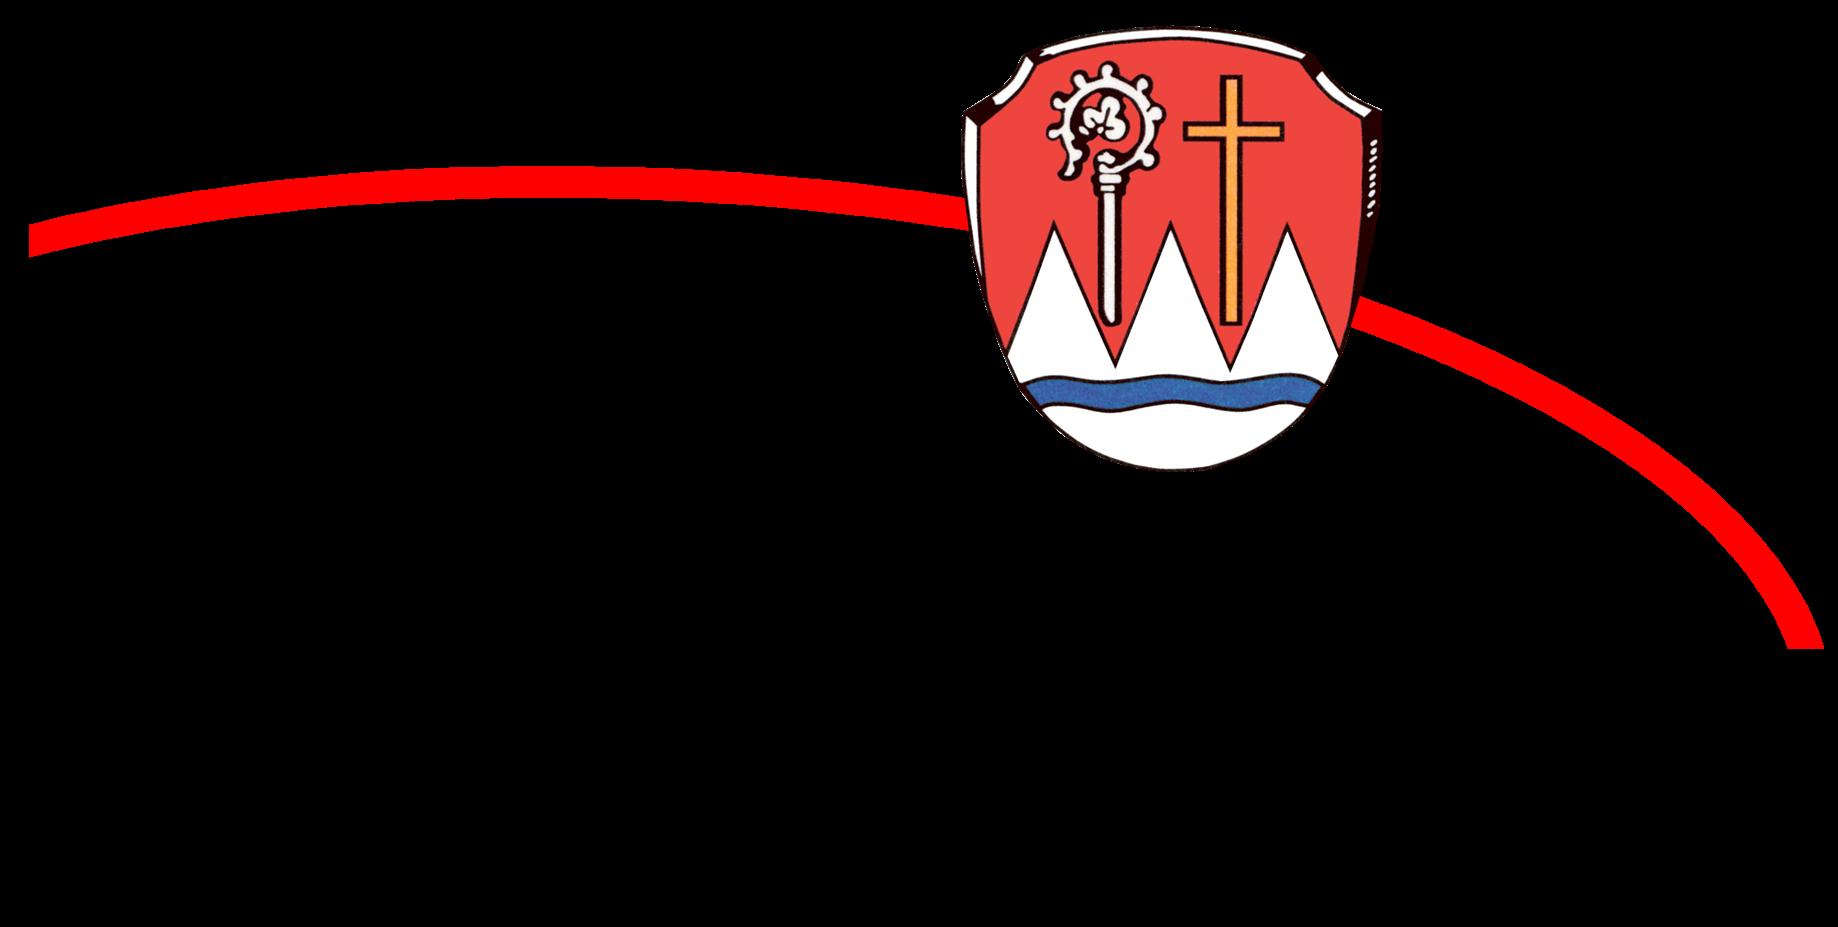 Freiwillige Feuerwehr Oberthulba